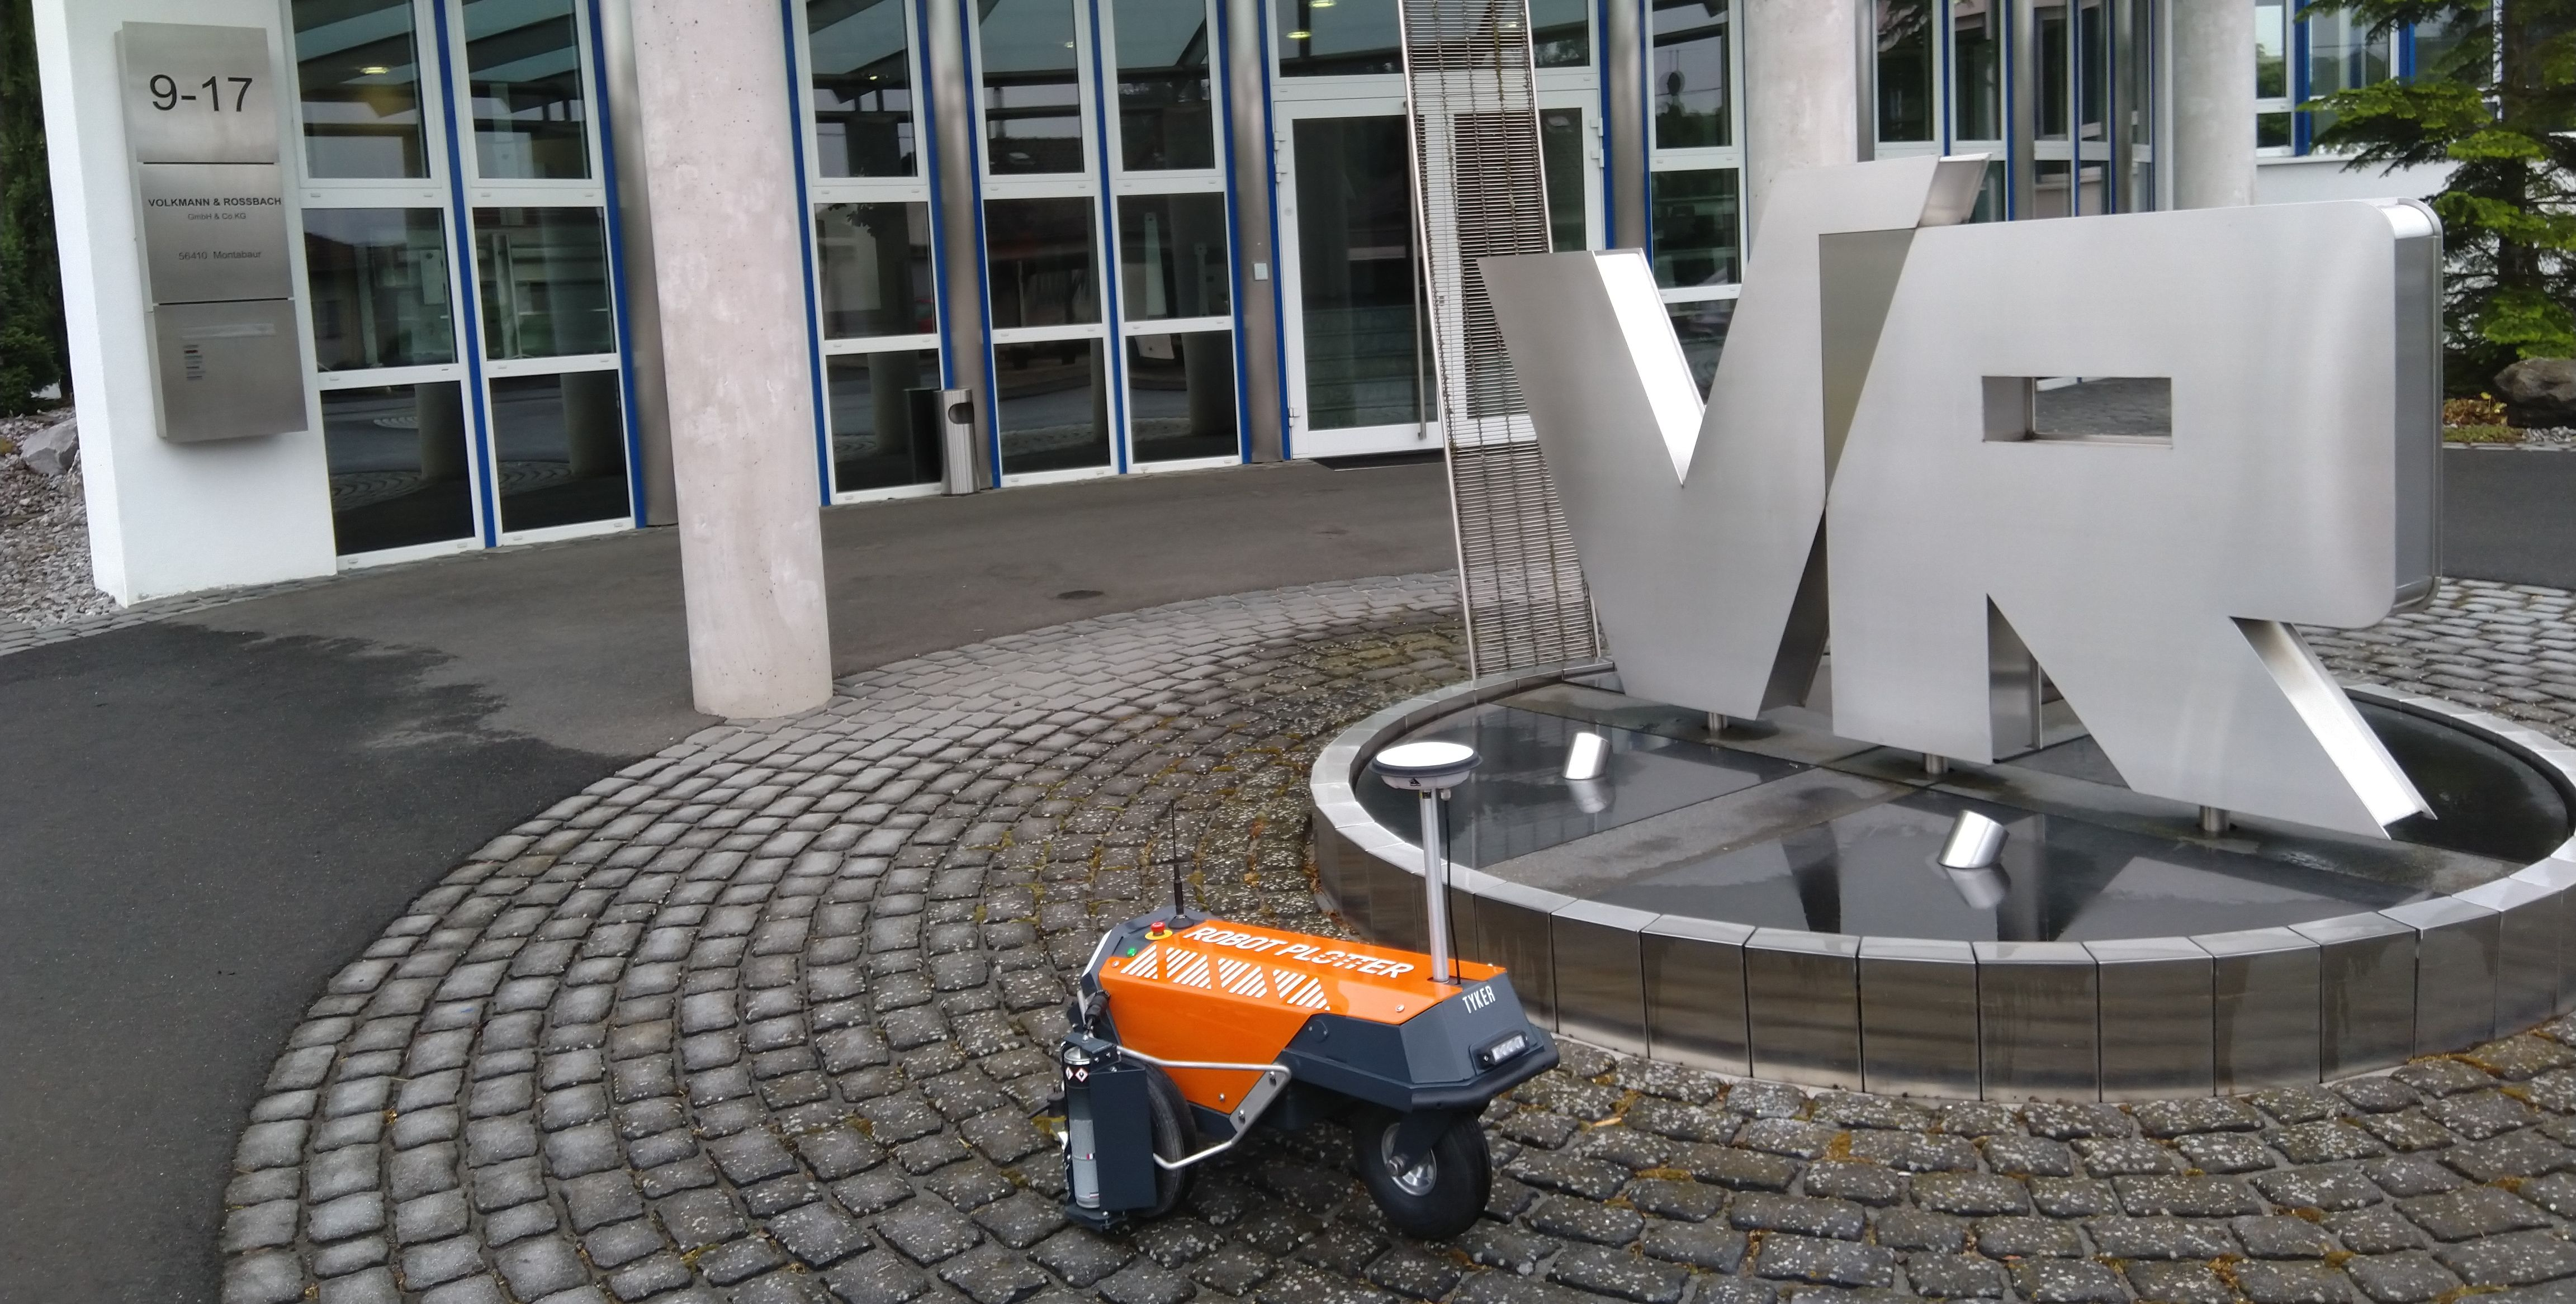 Robot Plotter gaat de grens over naar Duitsland: Volkmann & Rossbach heeft de primeur